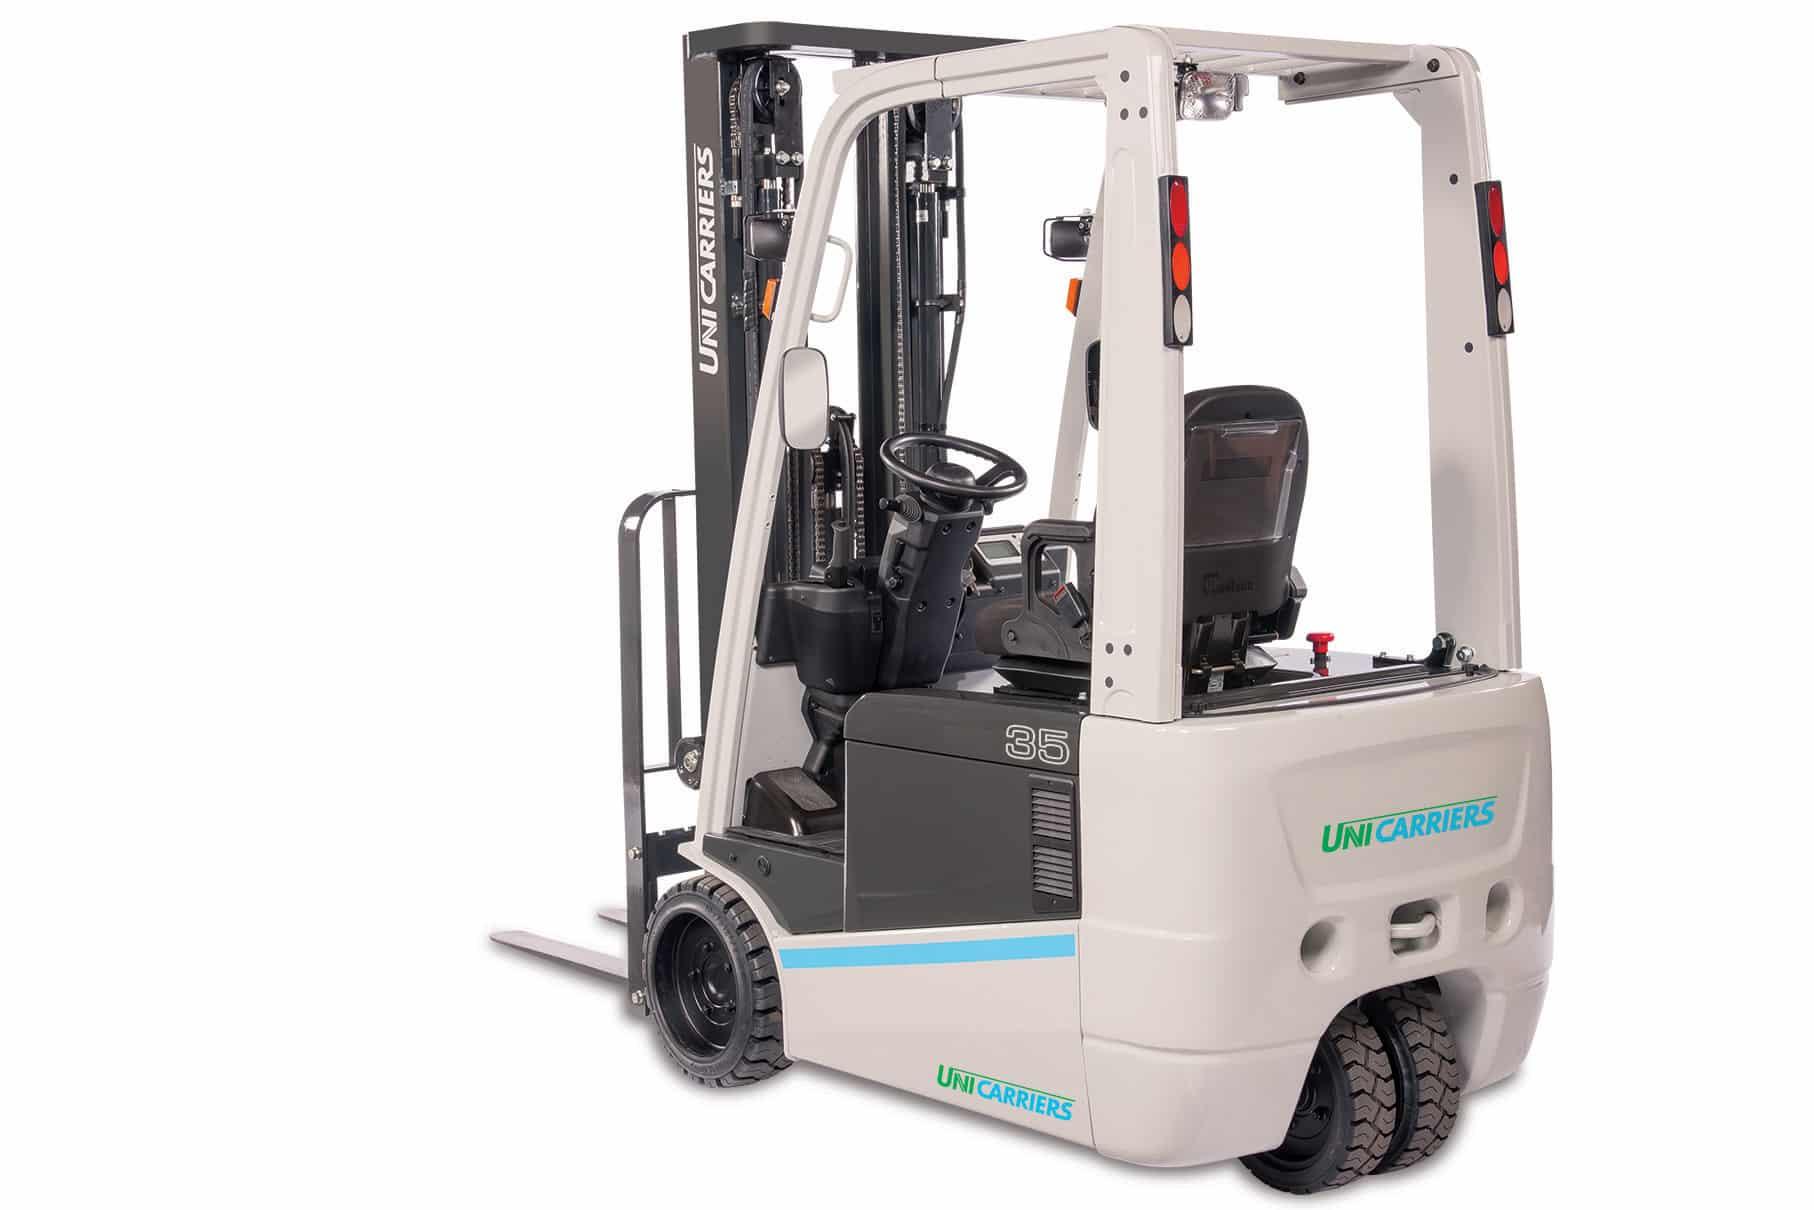 UniCarriers Forklift - TX-M 3-Wheel Electric Forklift - H&K Equipment